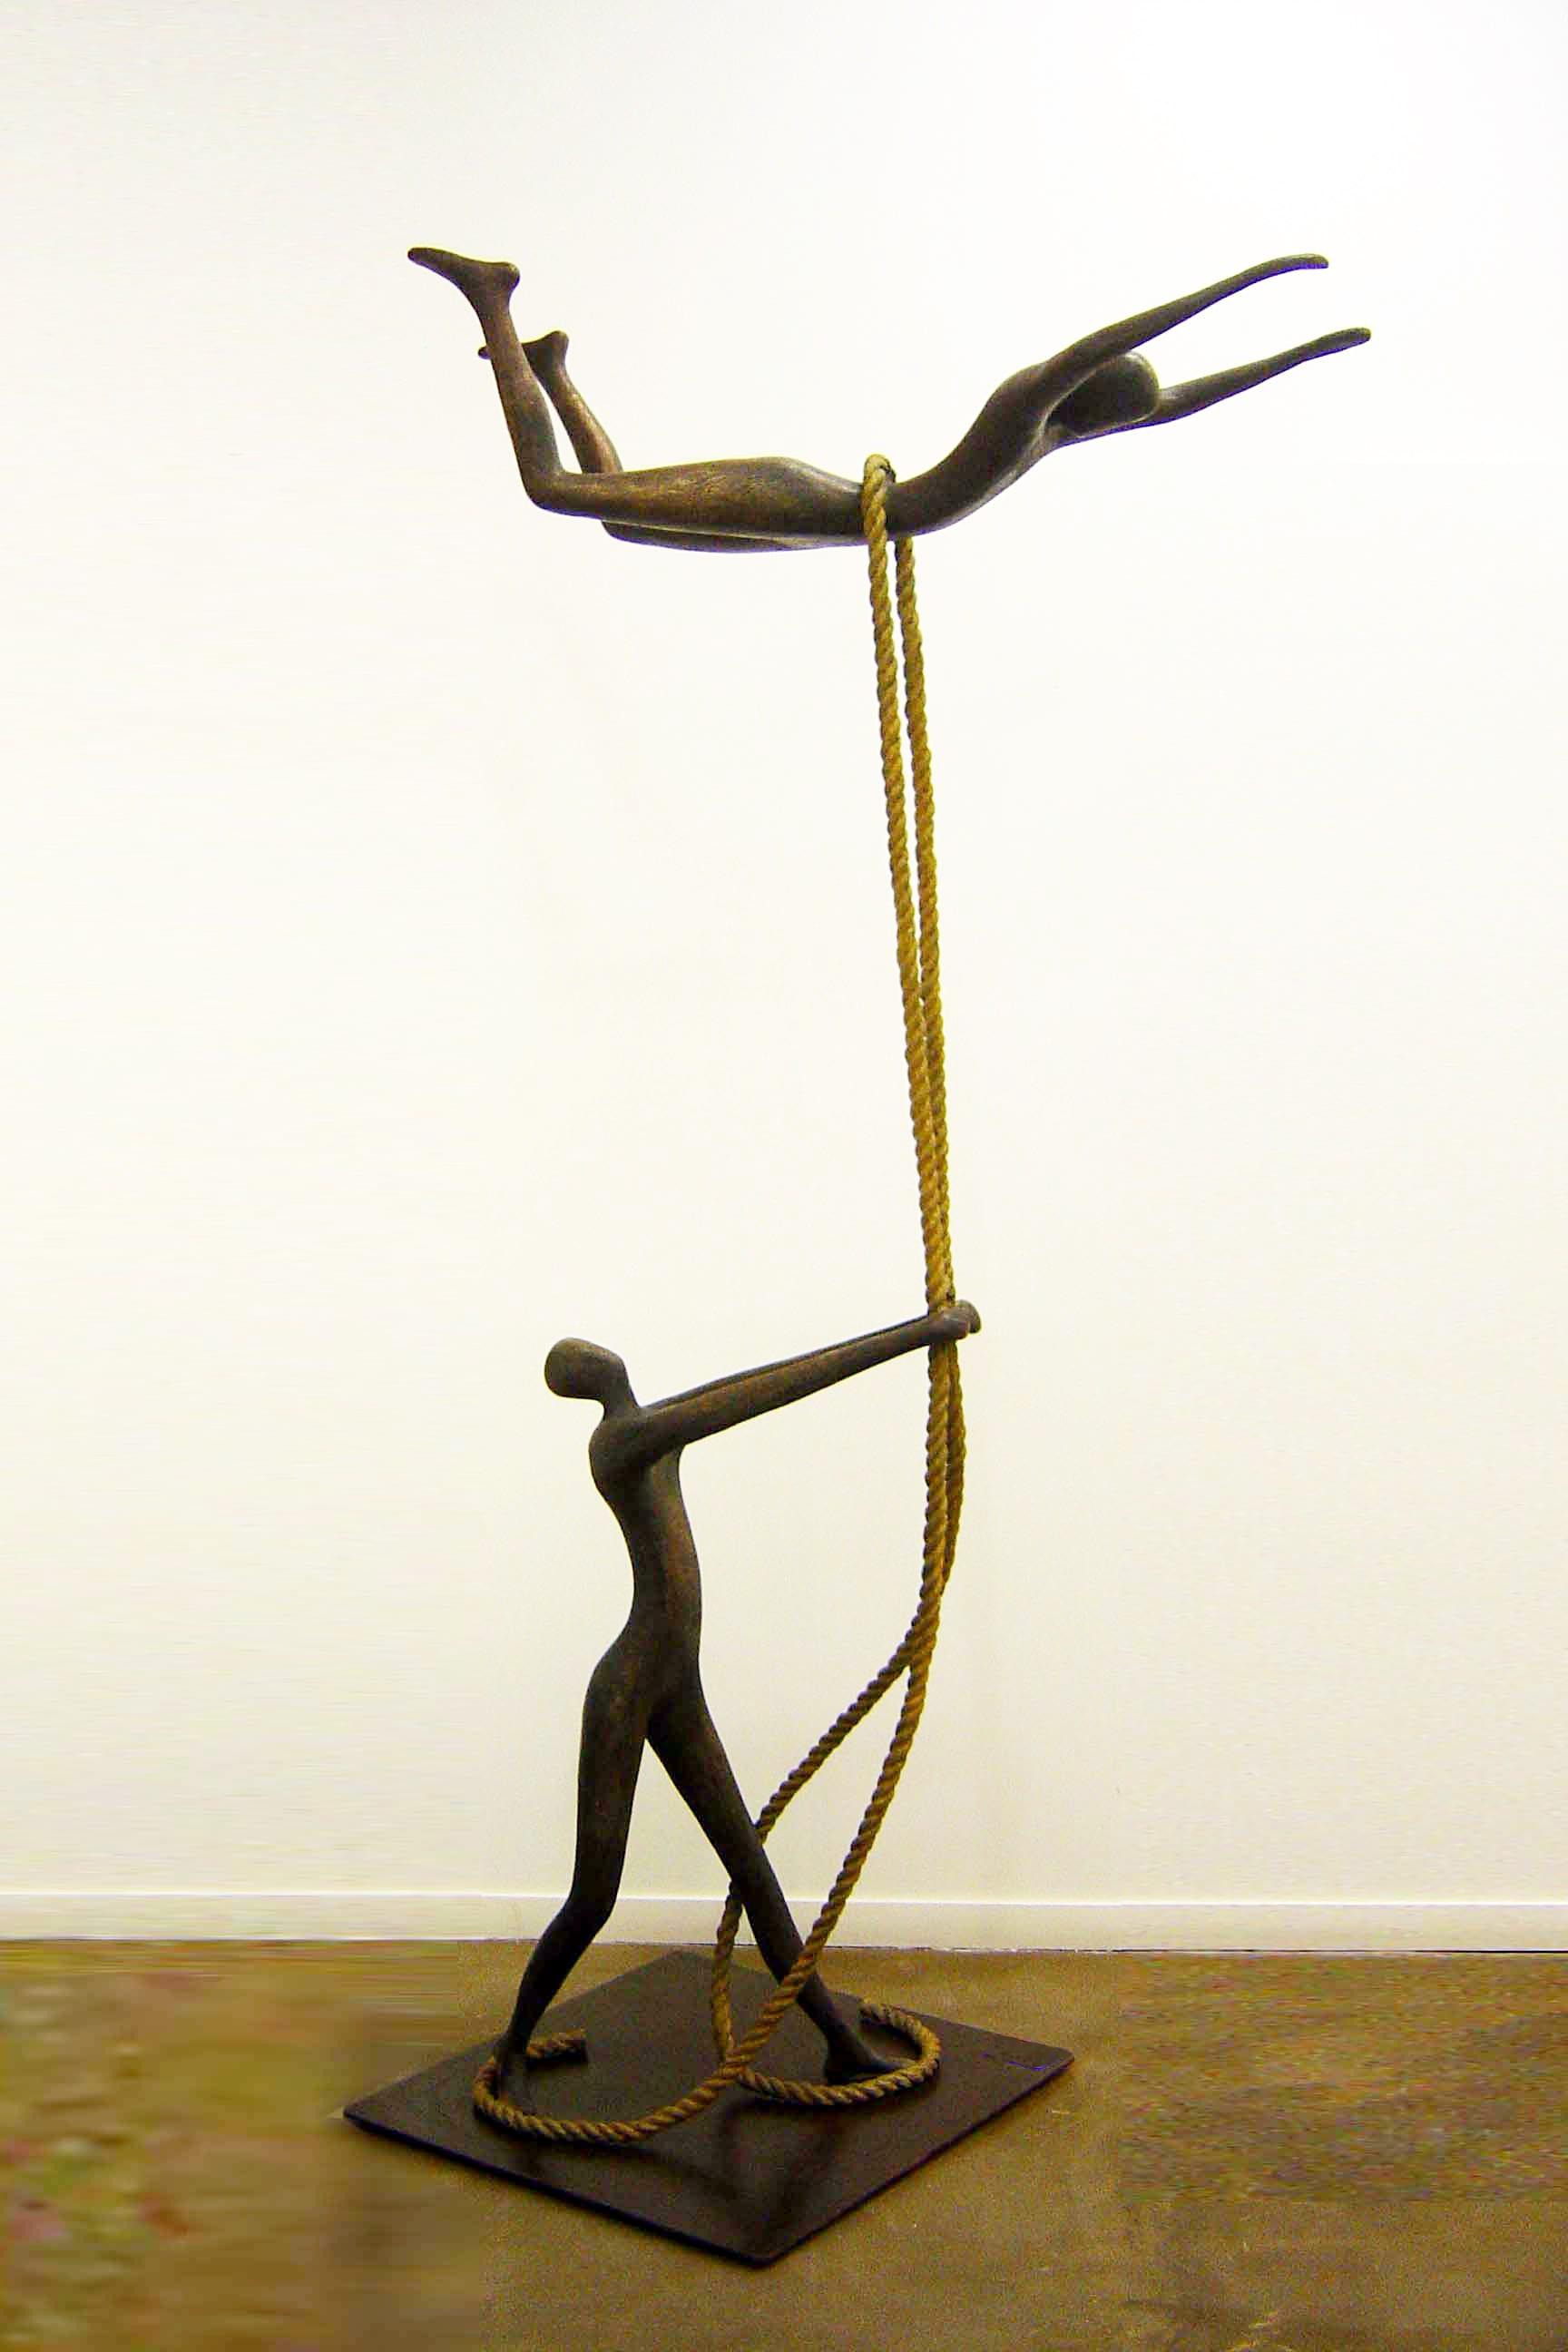 SKY HIGH Bronze 240x120cm / 94,4x47,2 inches